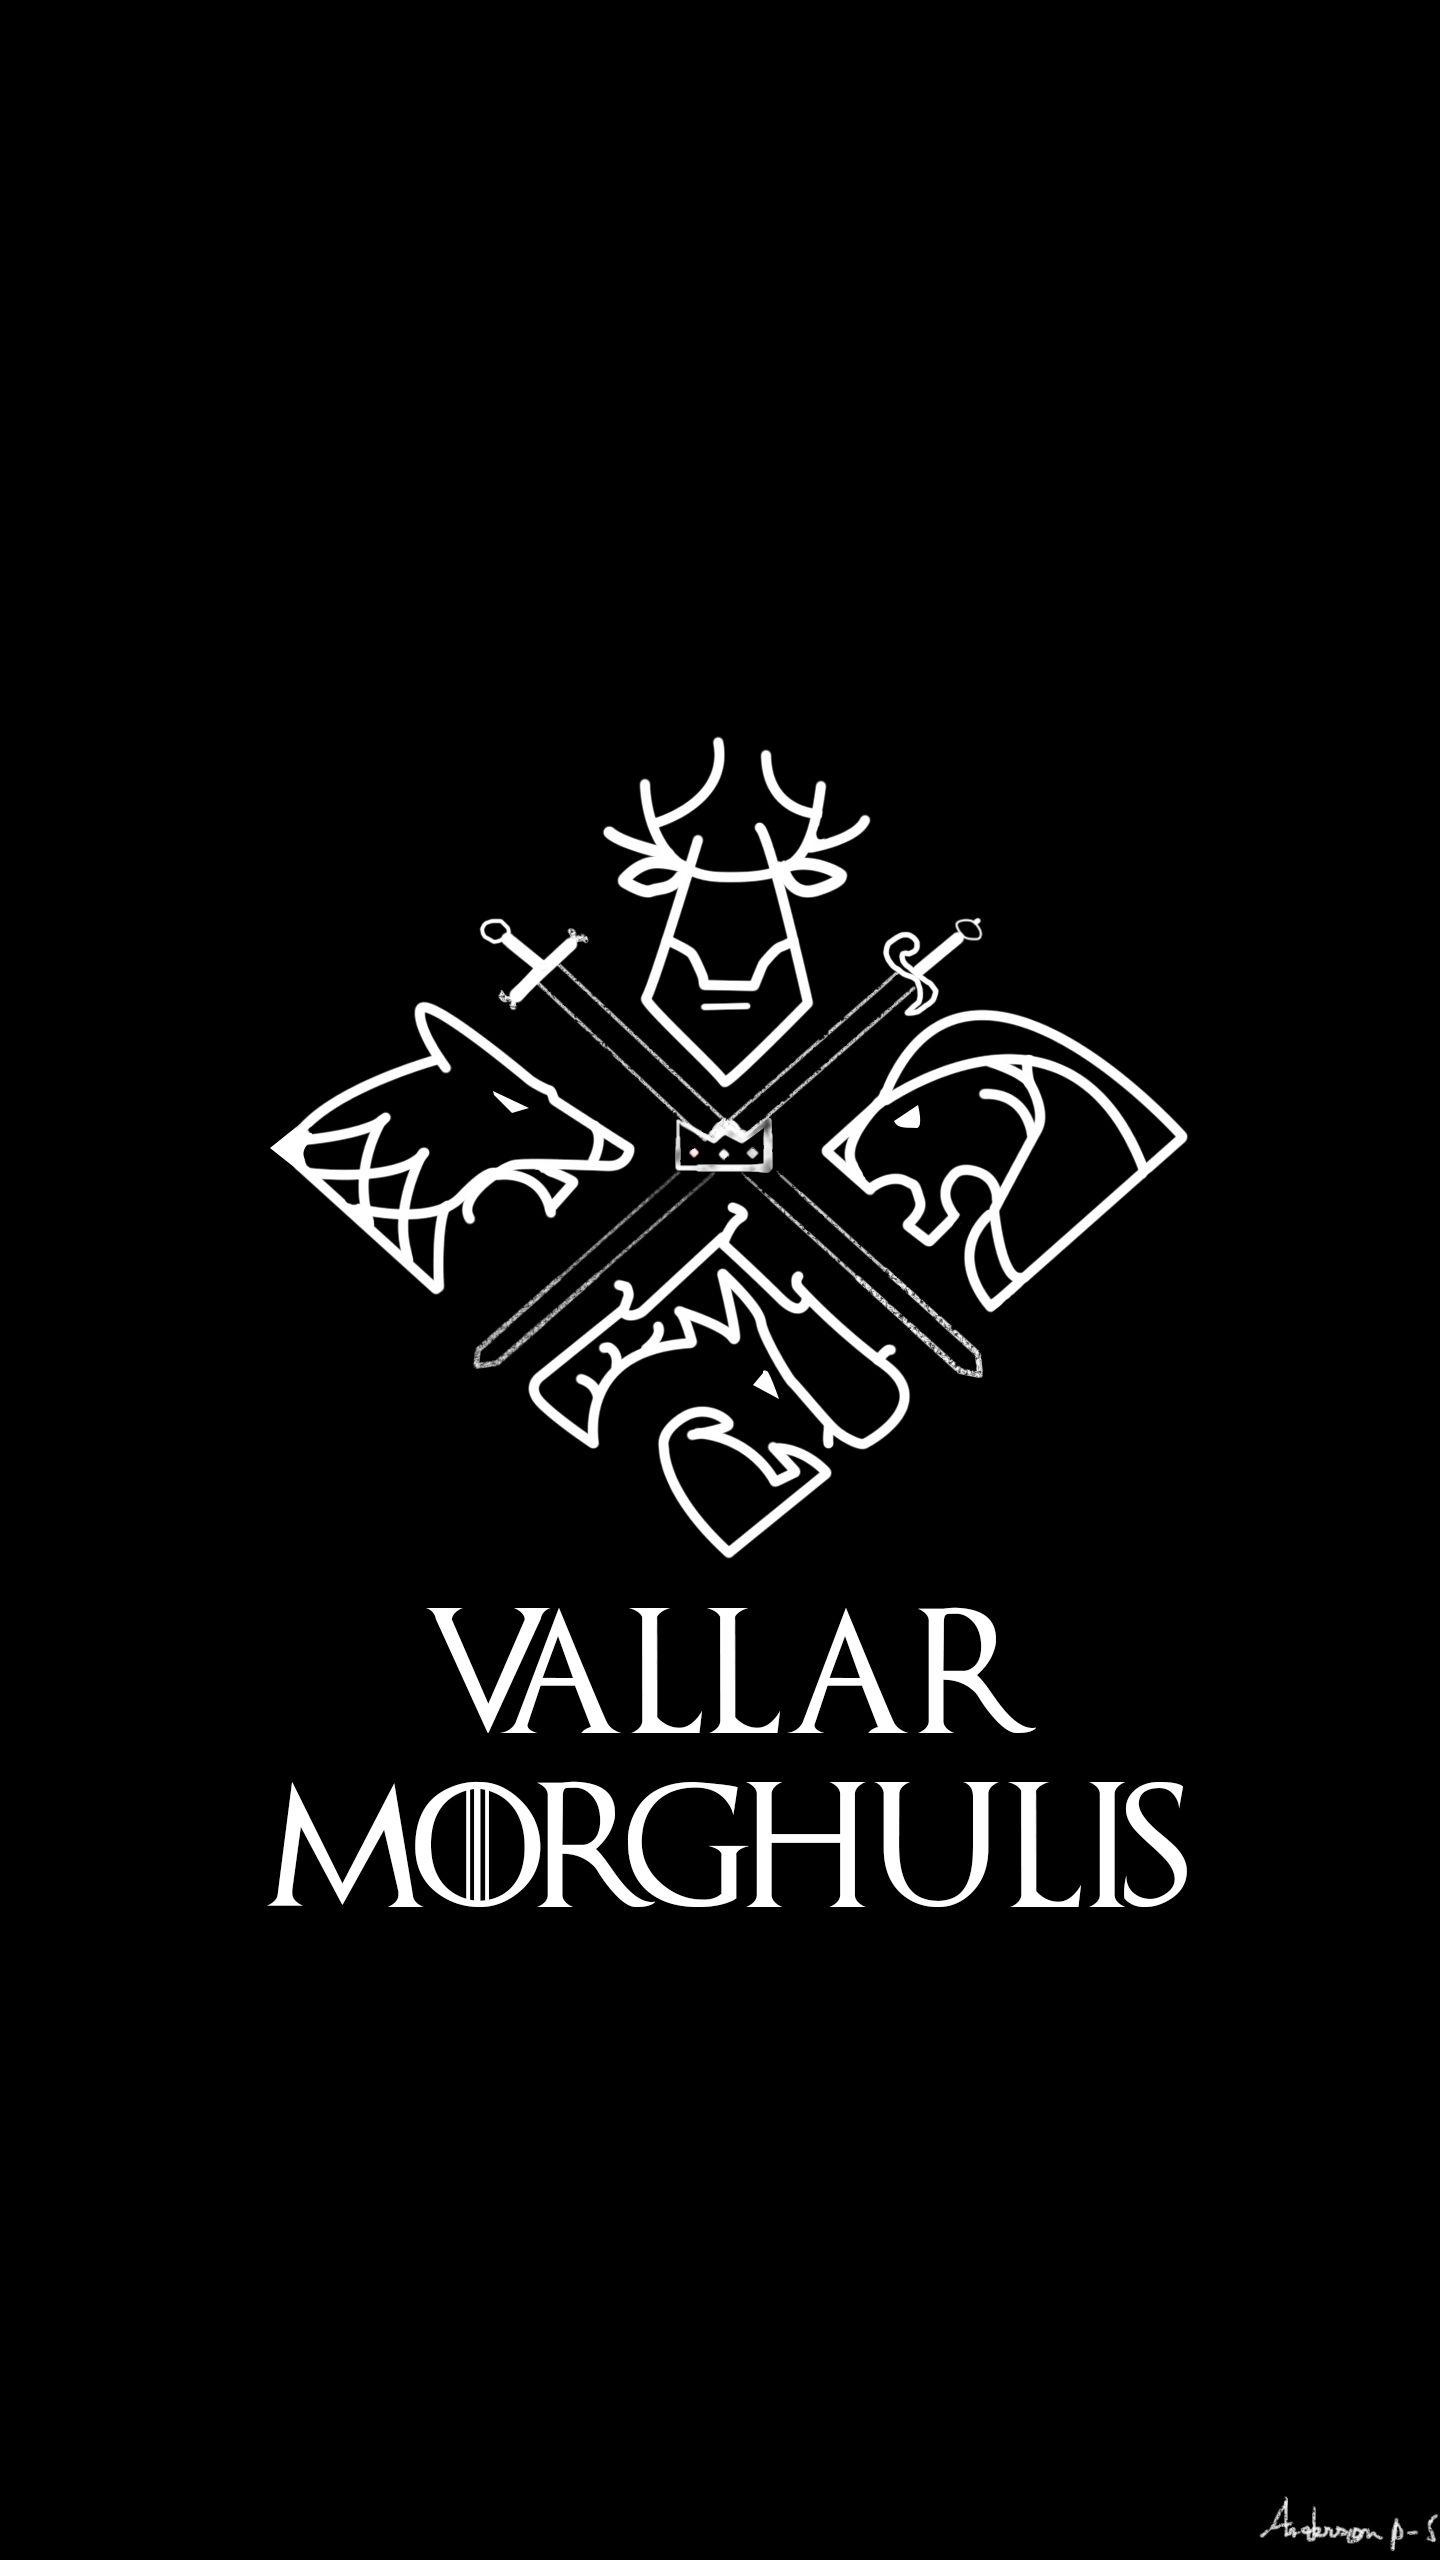 Game of thrones, Vallar Morghulis #gameofthrones